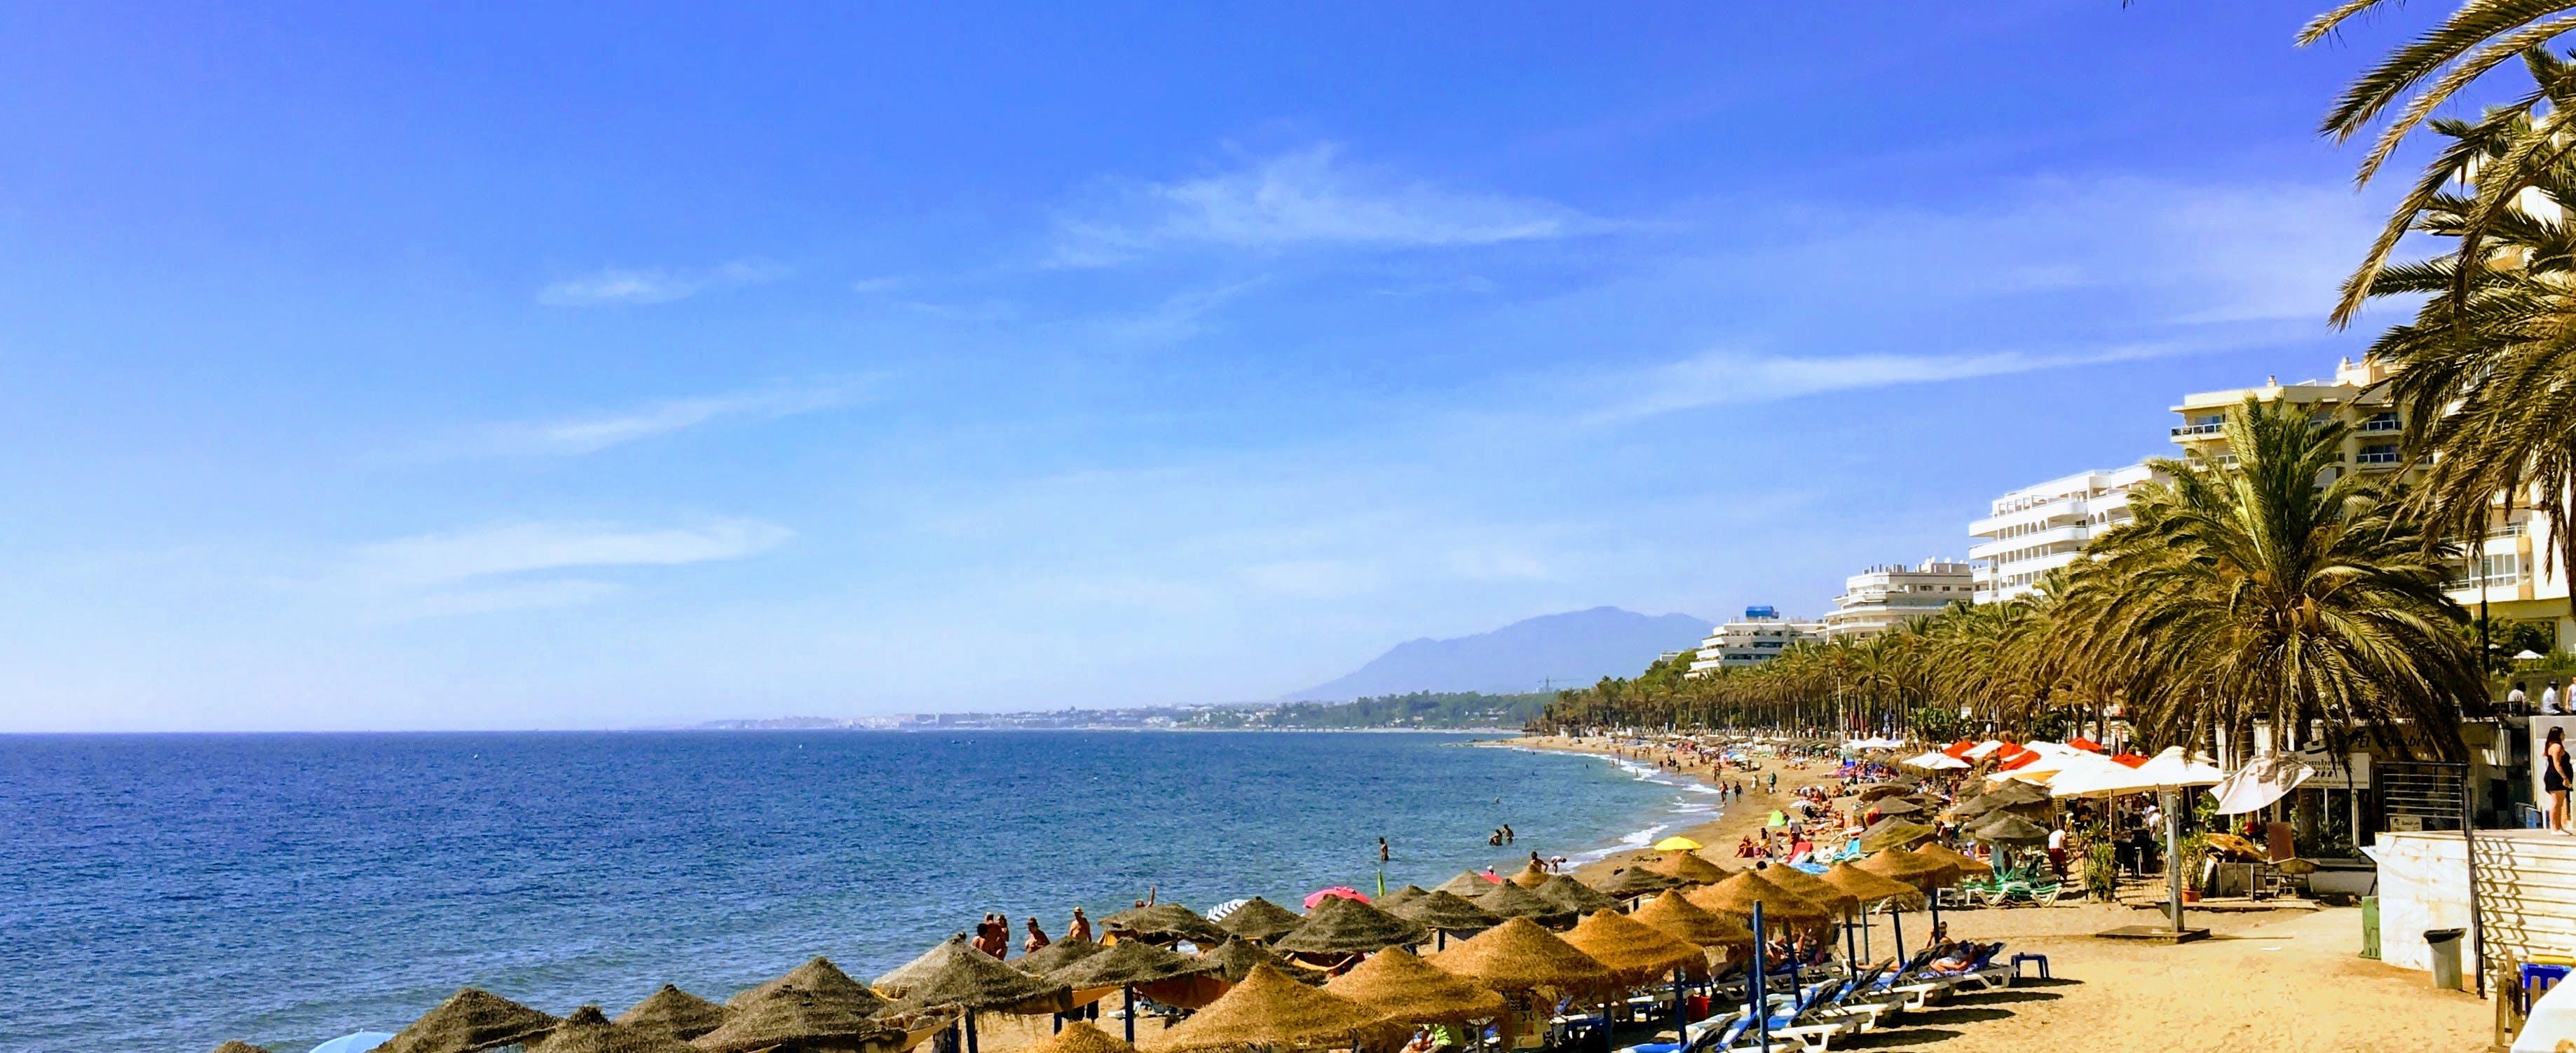 costa del sol, marbella, marbella 2018